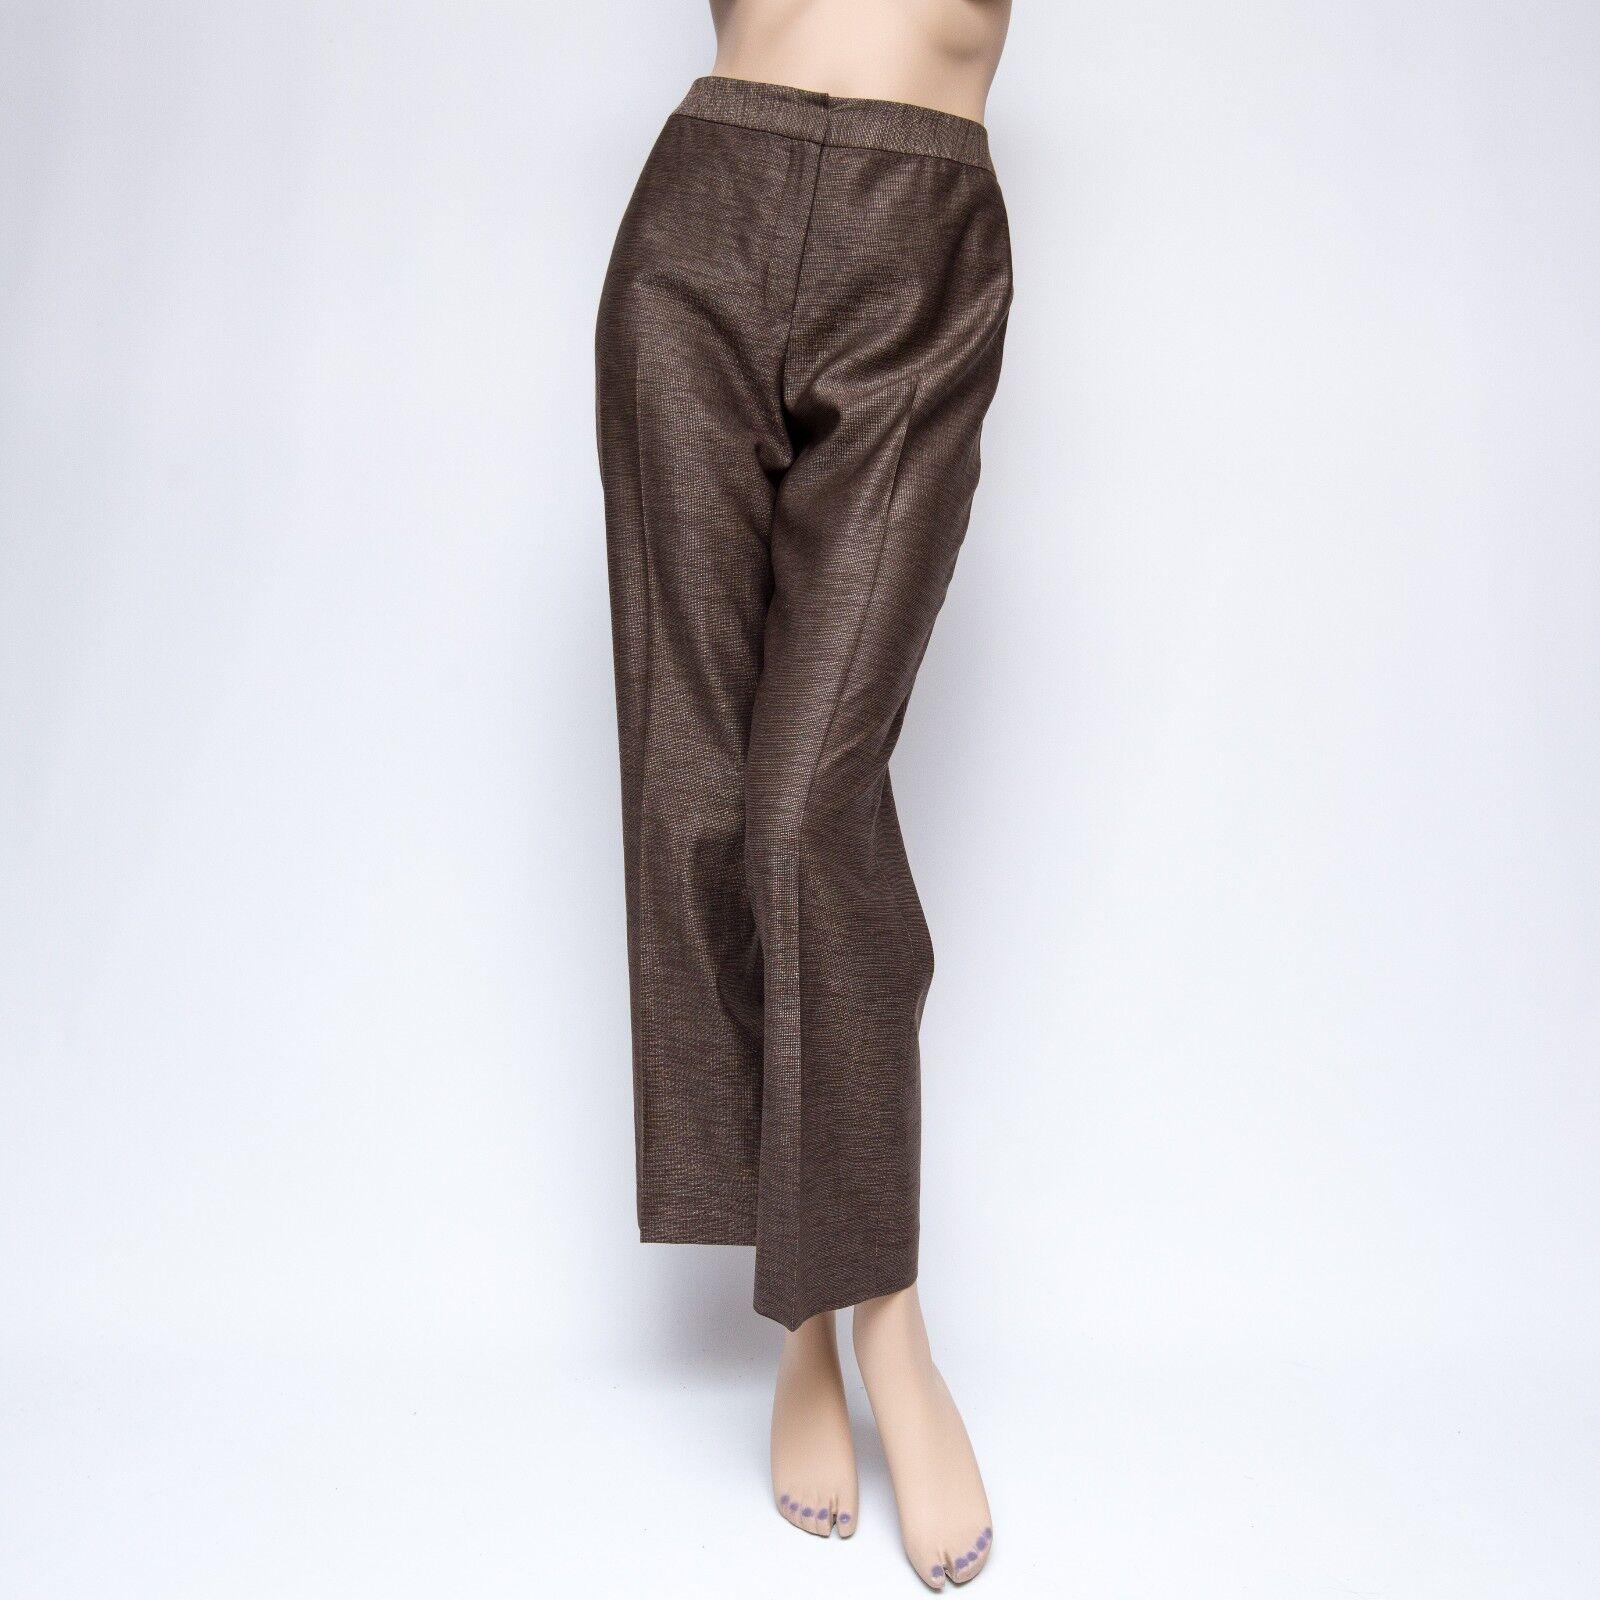 Lafayette 148 6x28 Brown Tweed Wool Unlined Dress Pants US6